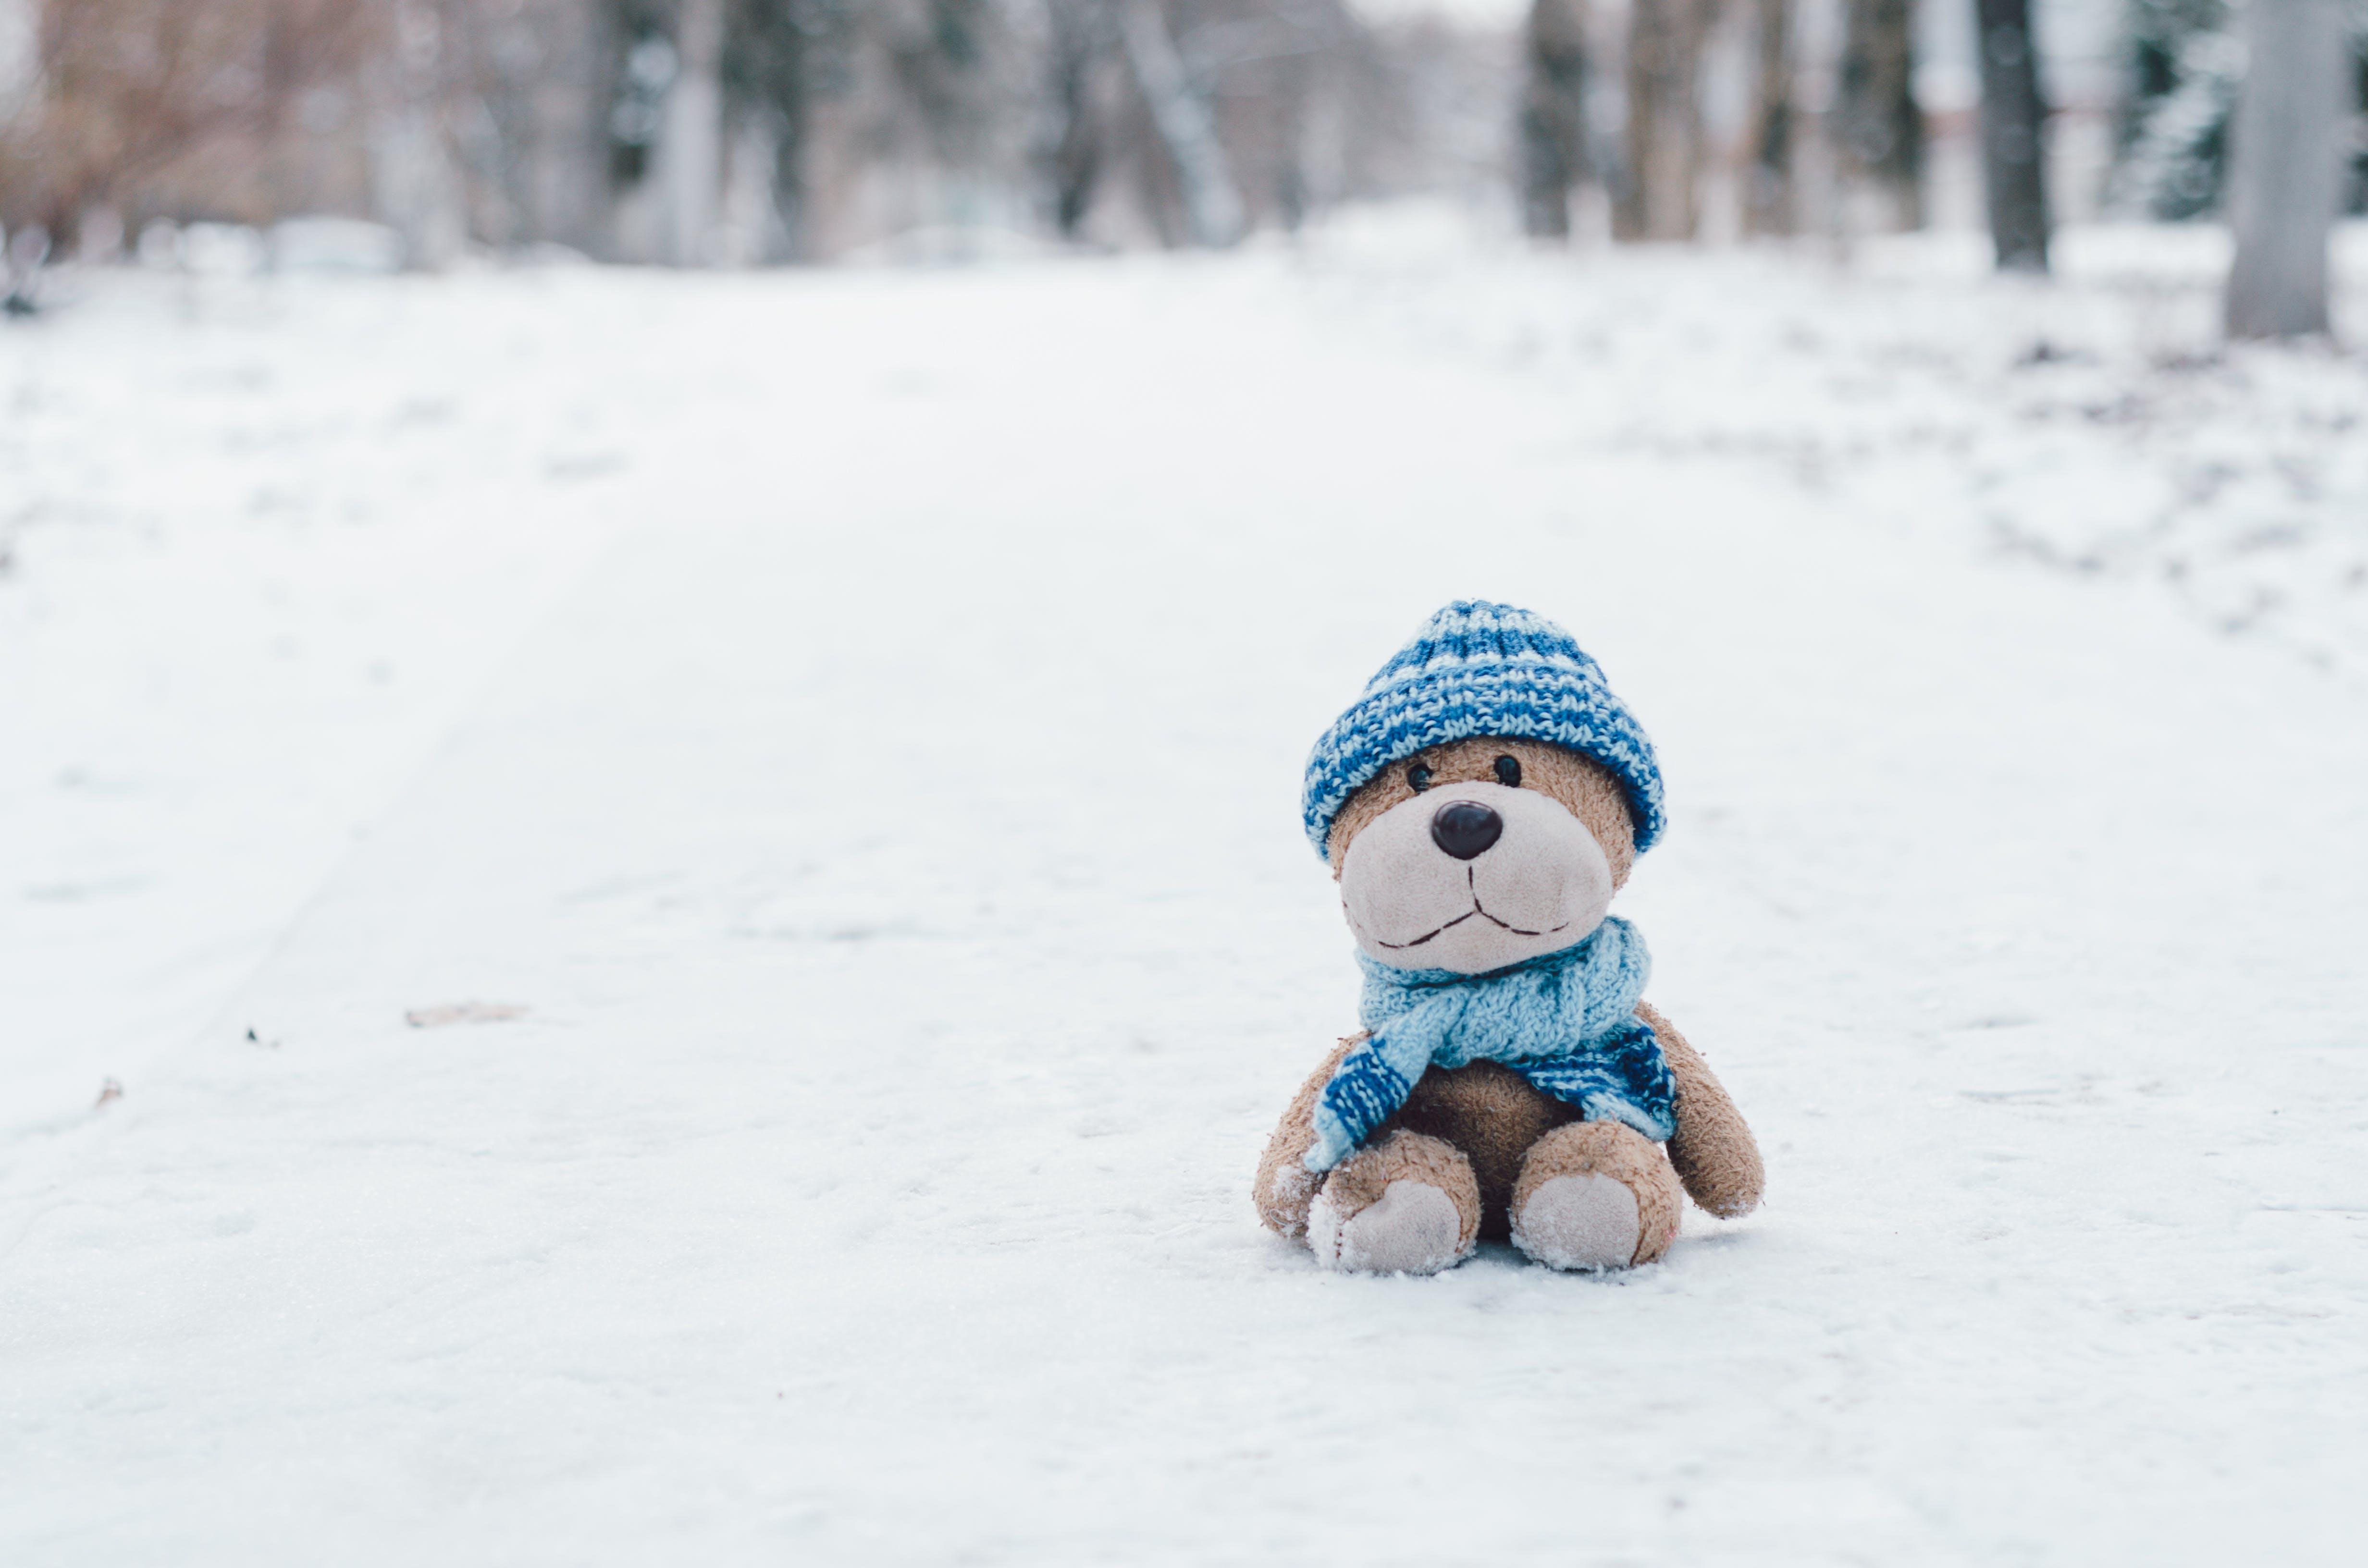 Stuffed Toy On Snow